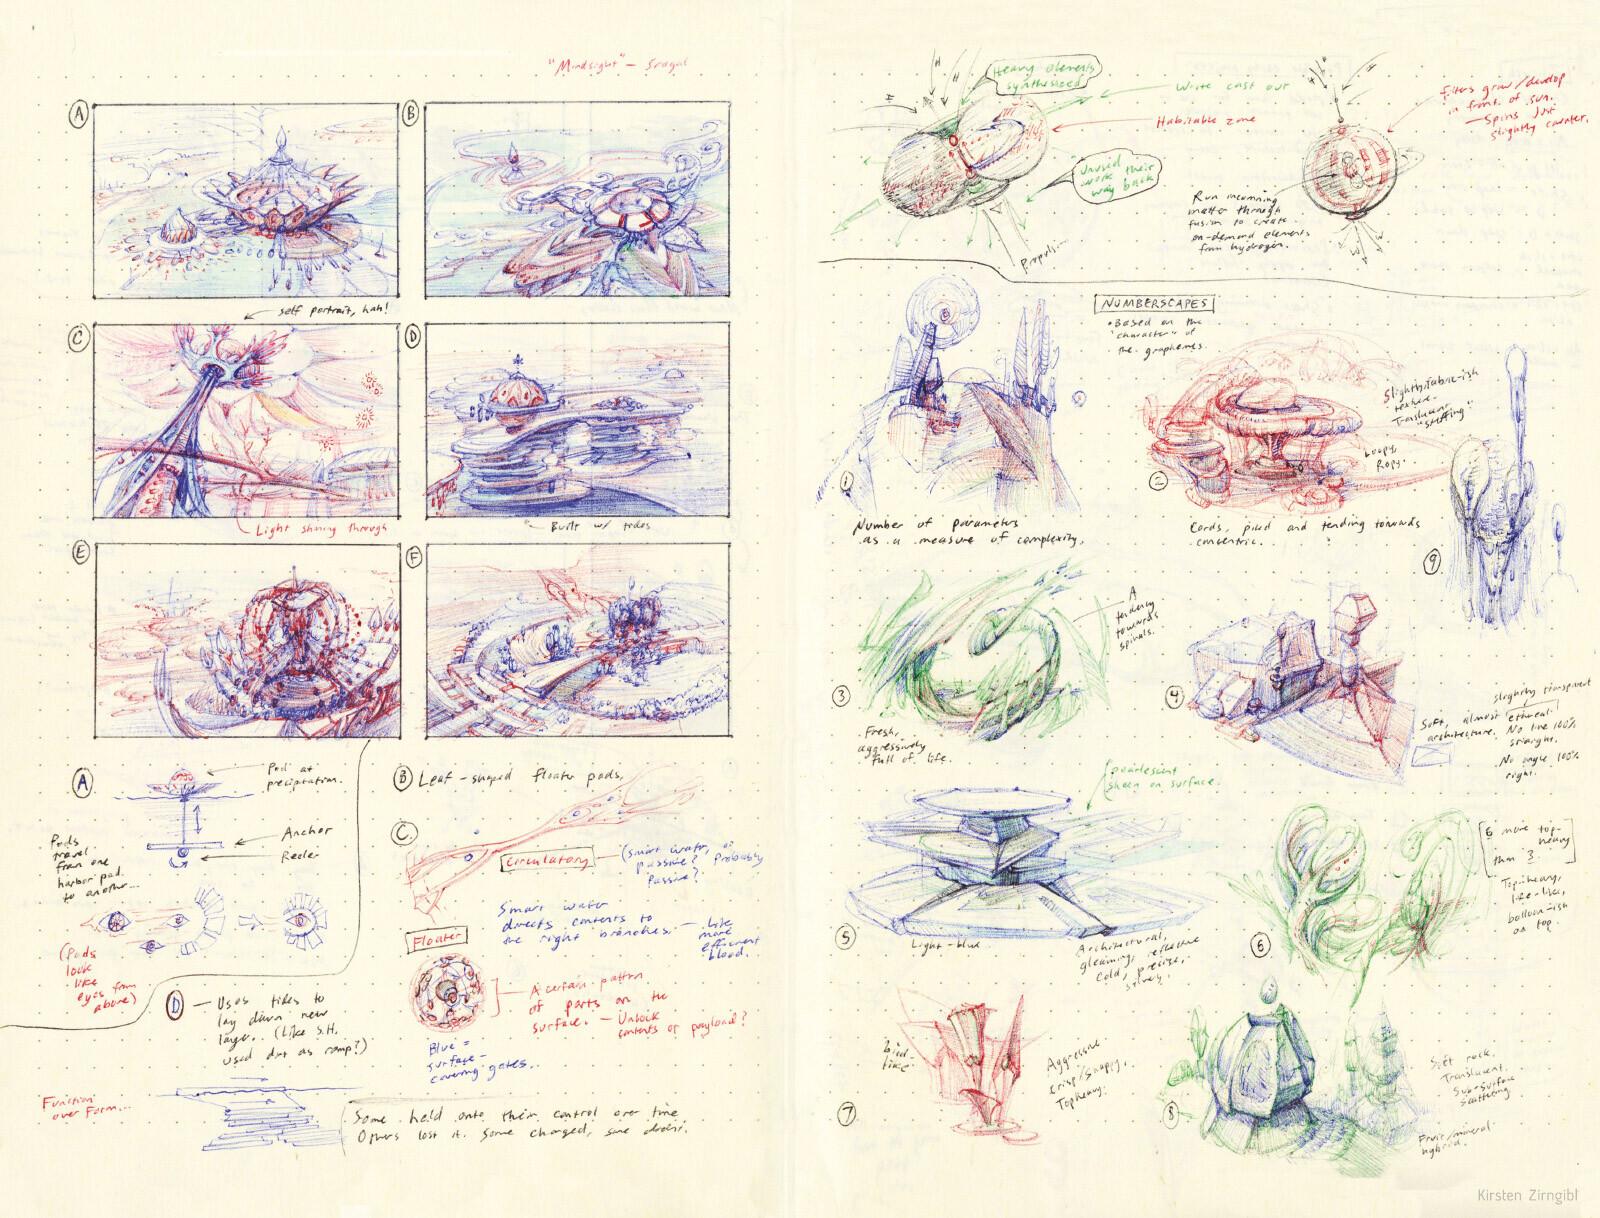 Brainstorming Sketchbook Collection (Part 1)